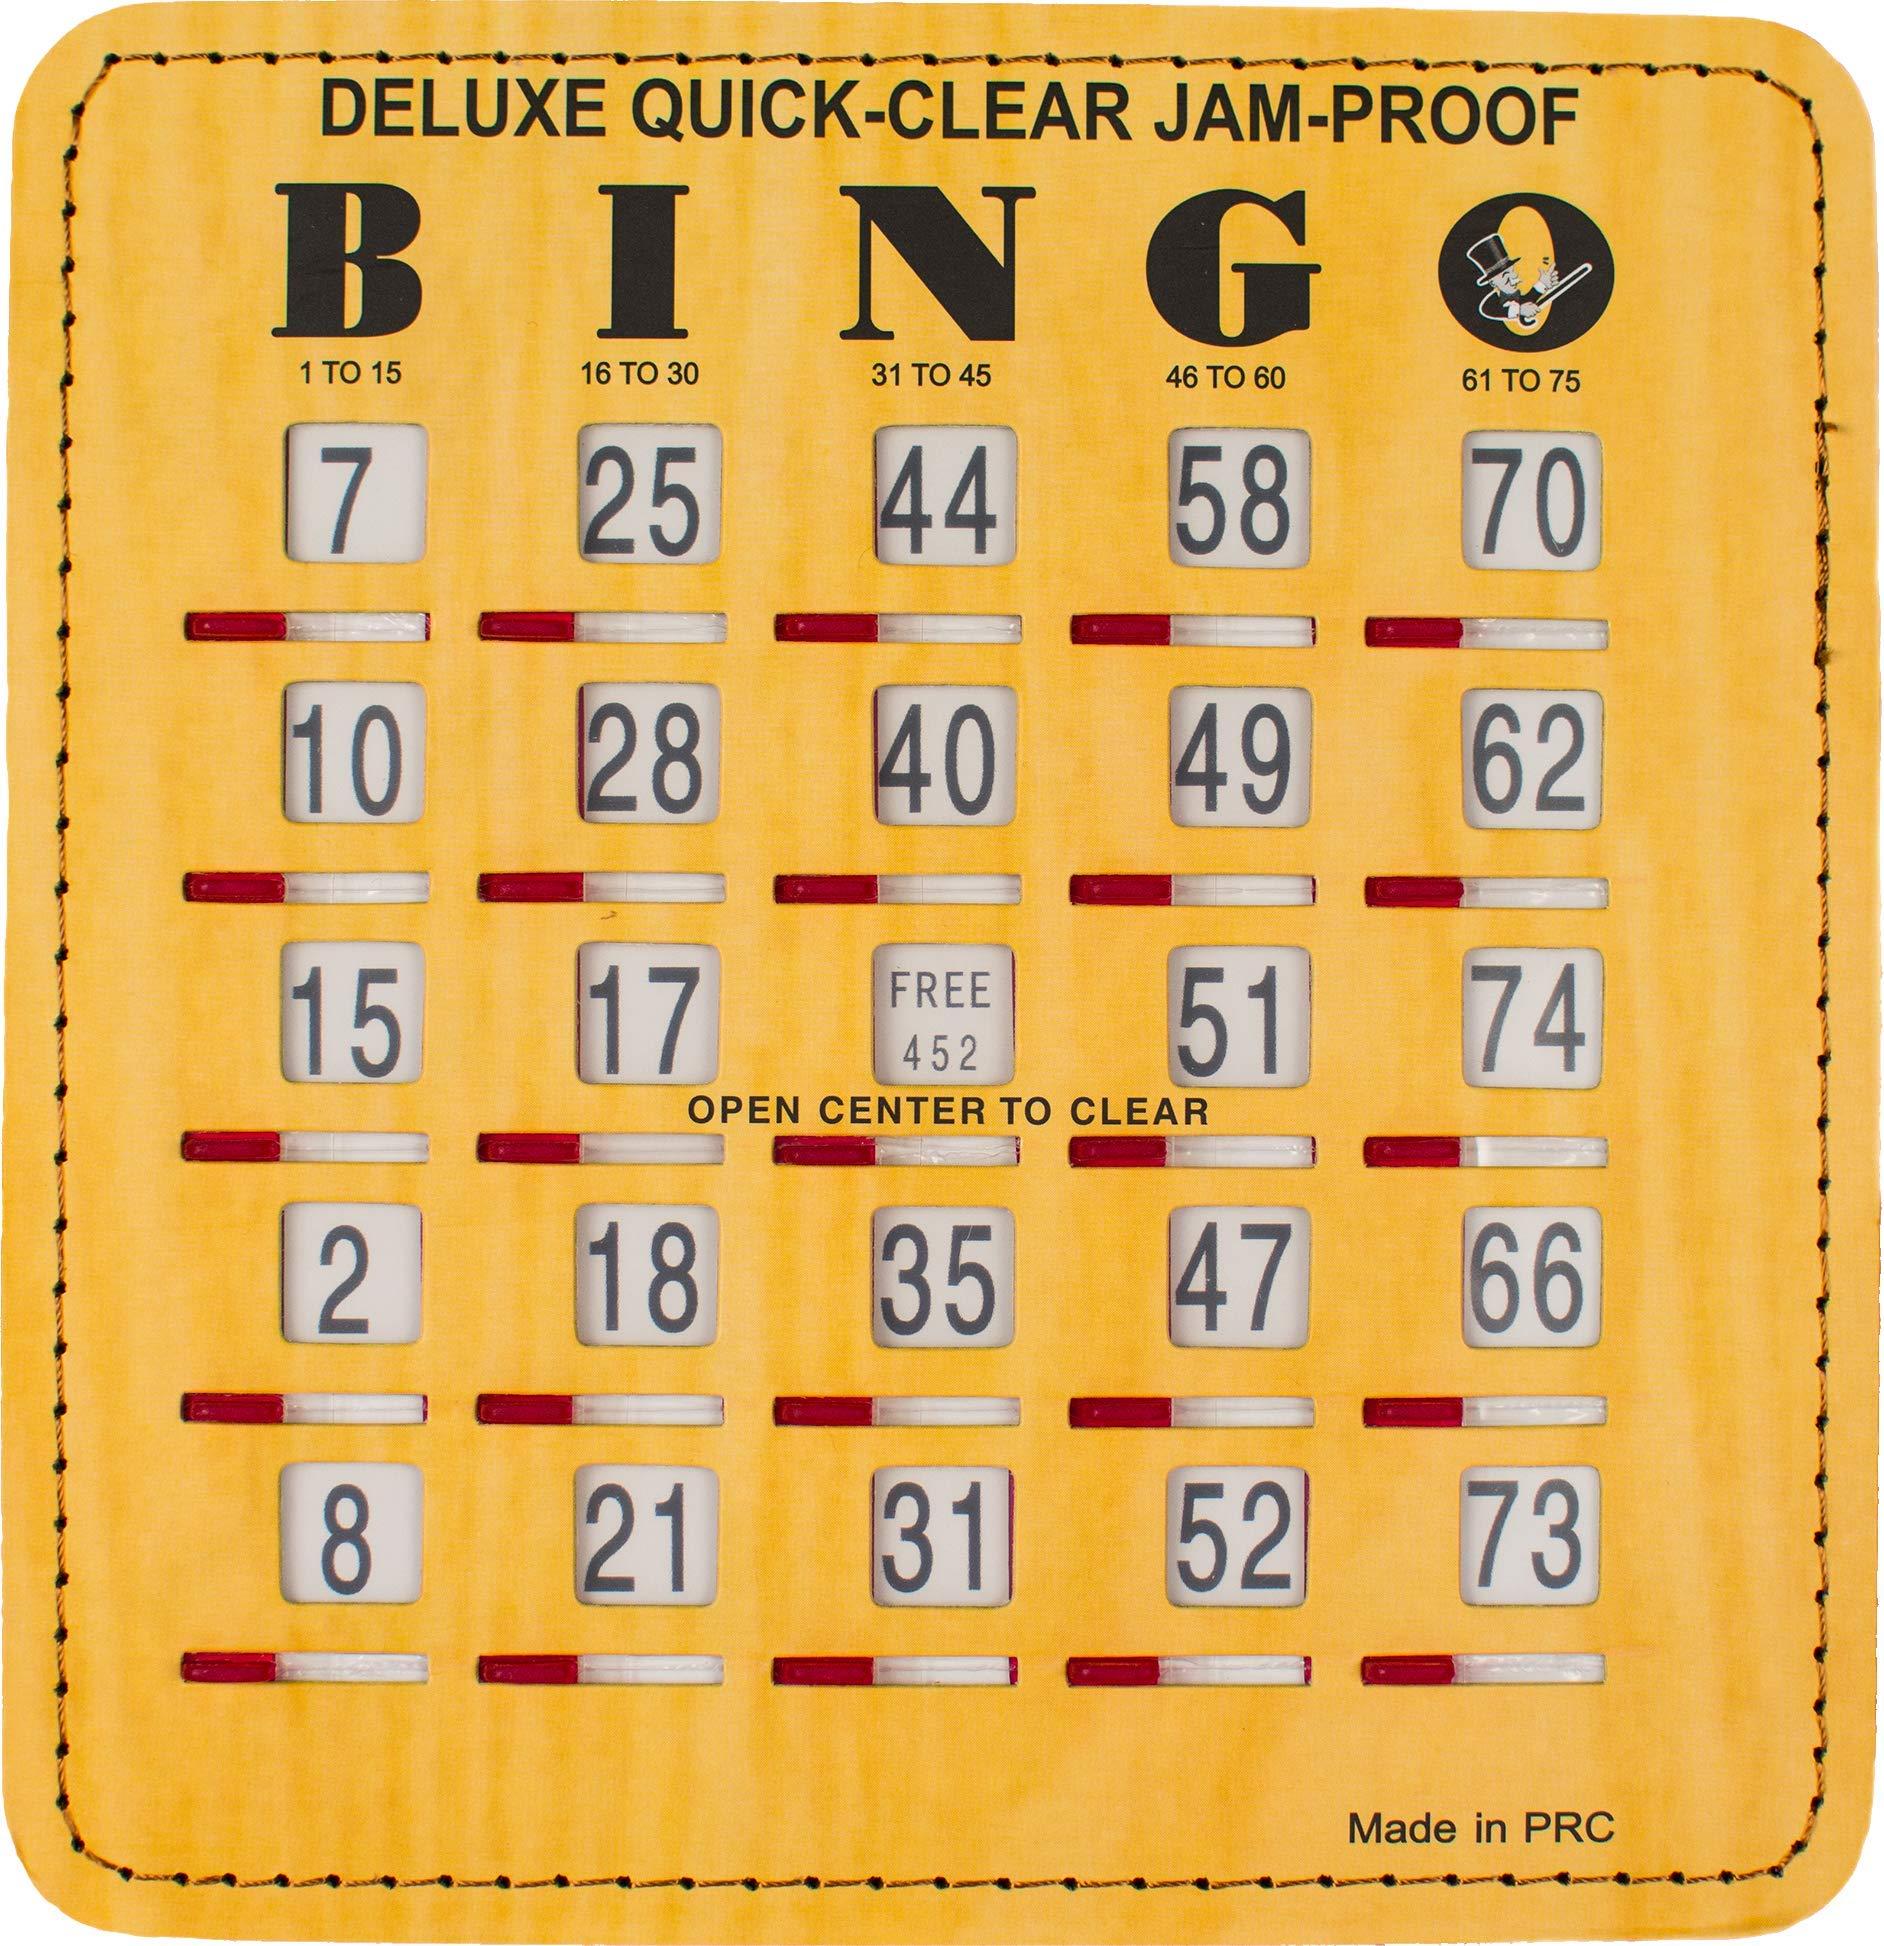 MR CHIPS Sliding Bingo Card for Kids and Seniors - Stitched Edges - Reusable - Jam Proof - Woodgrain - 200Pk